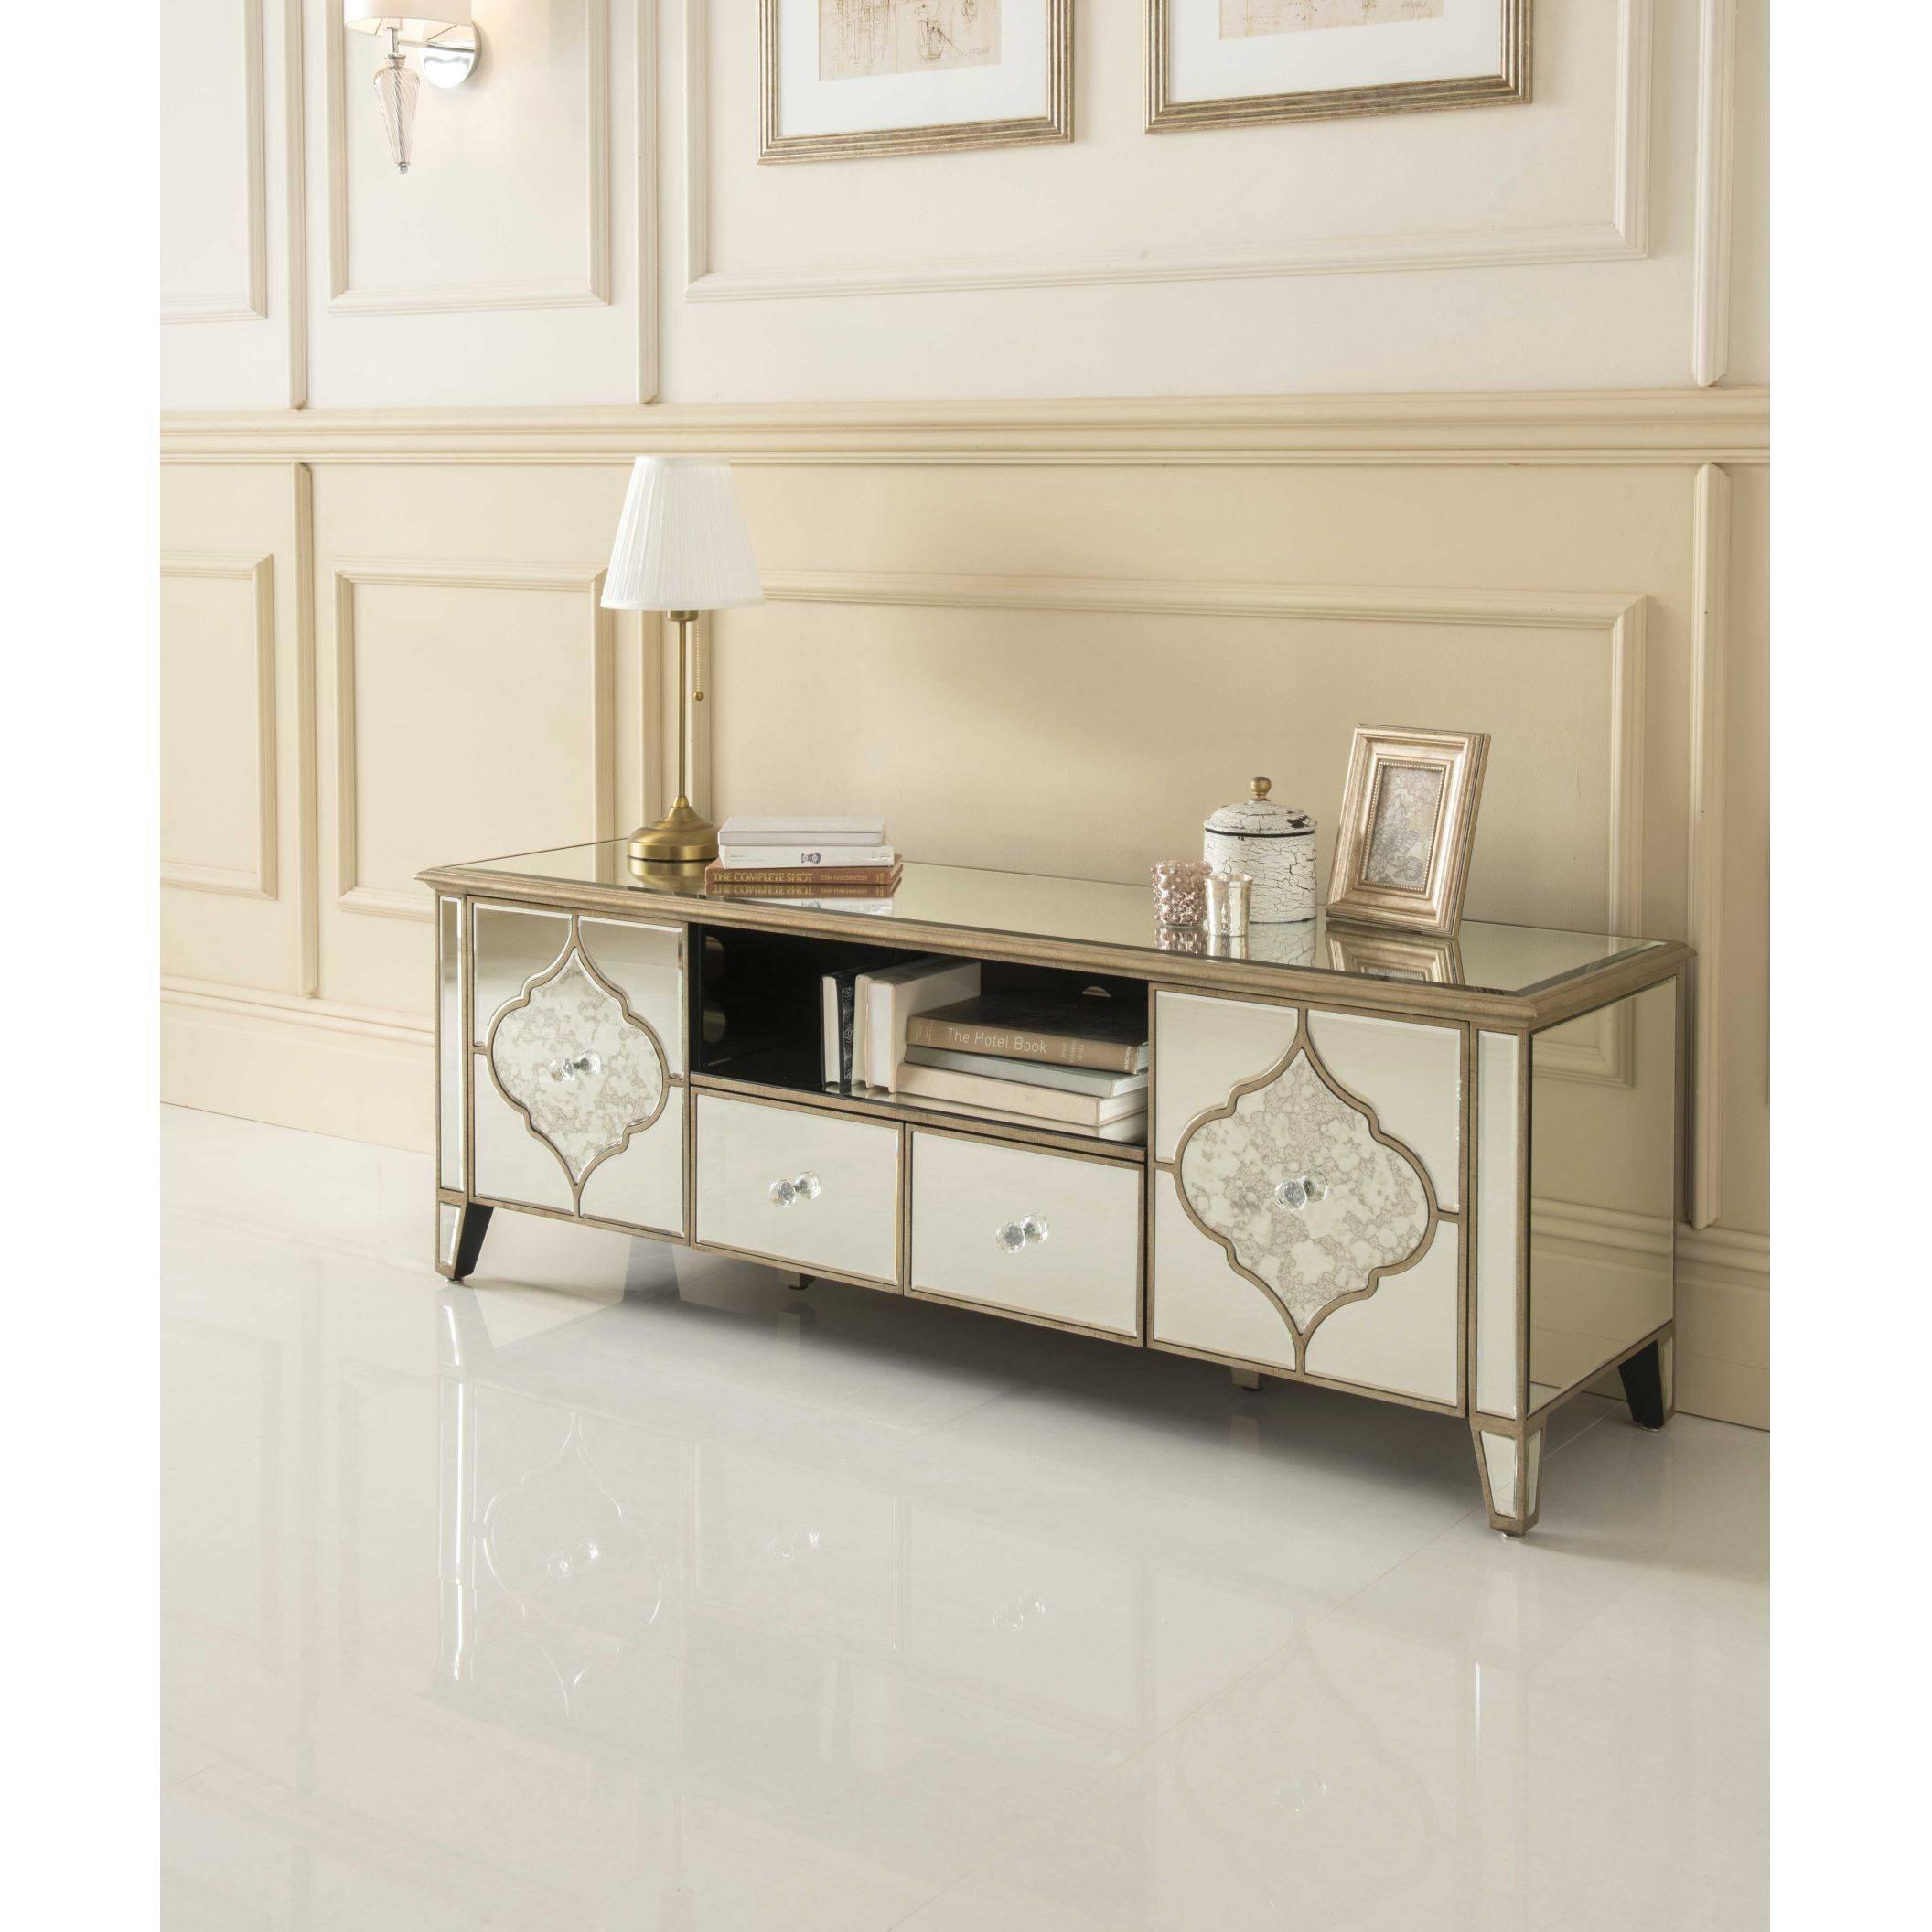 Sassari Mirrored Tv Cabinet | Glass Furniture With Regard To Venetian Mirrored Sideboard (#16 of 20)